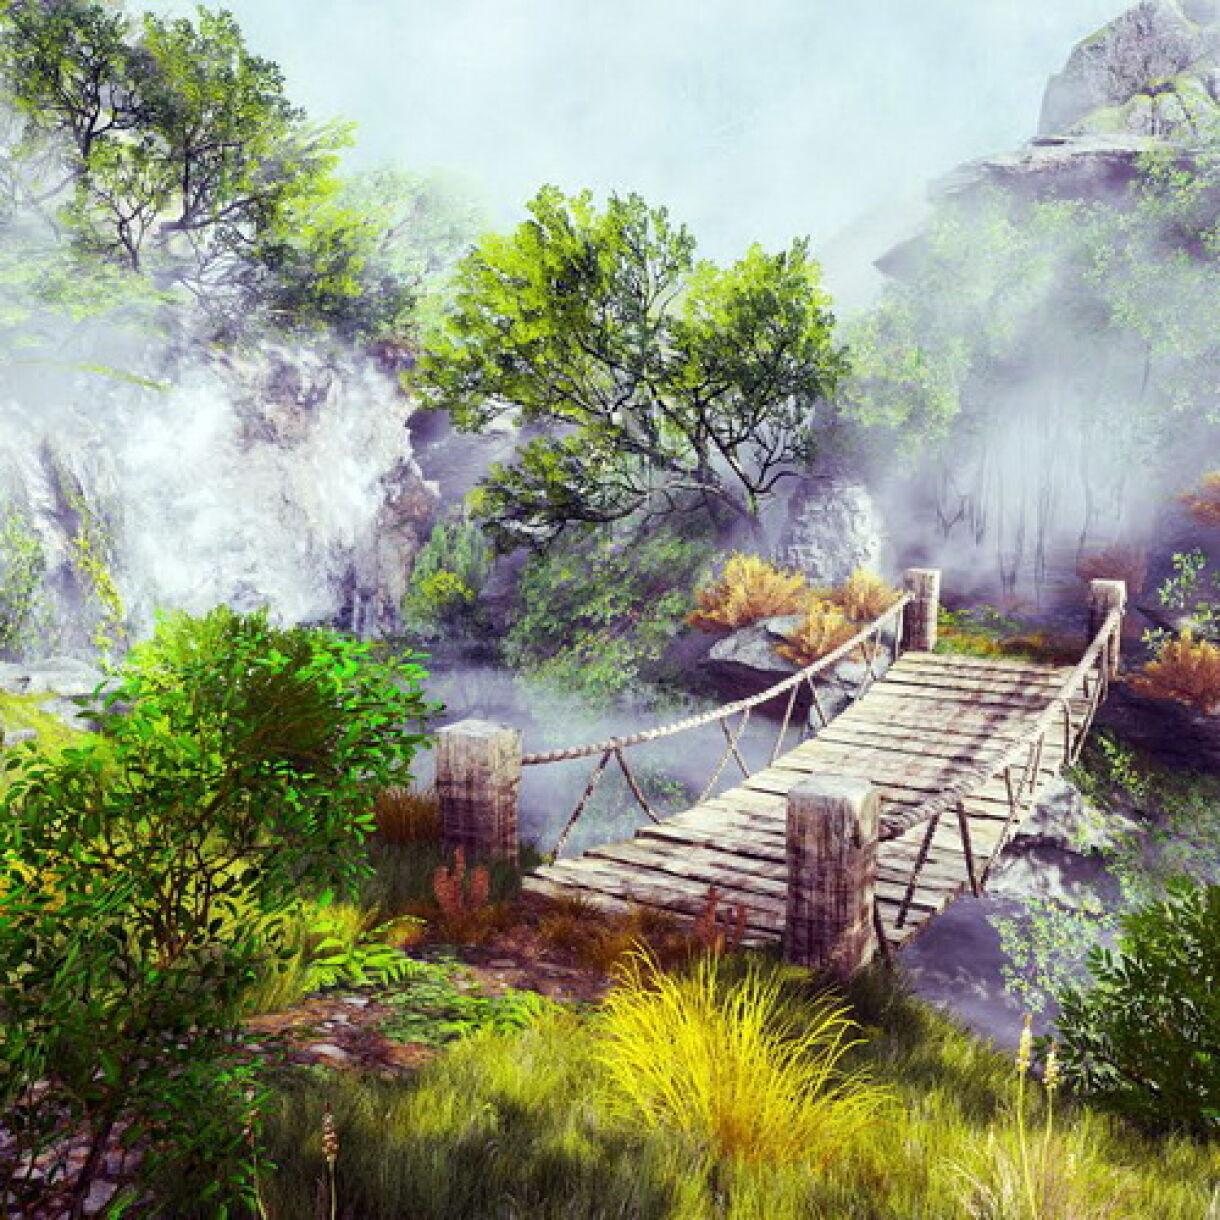 Fantasiam: Upgrading the Indie Game Look